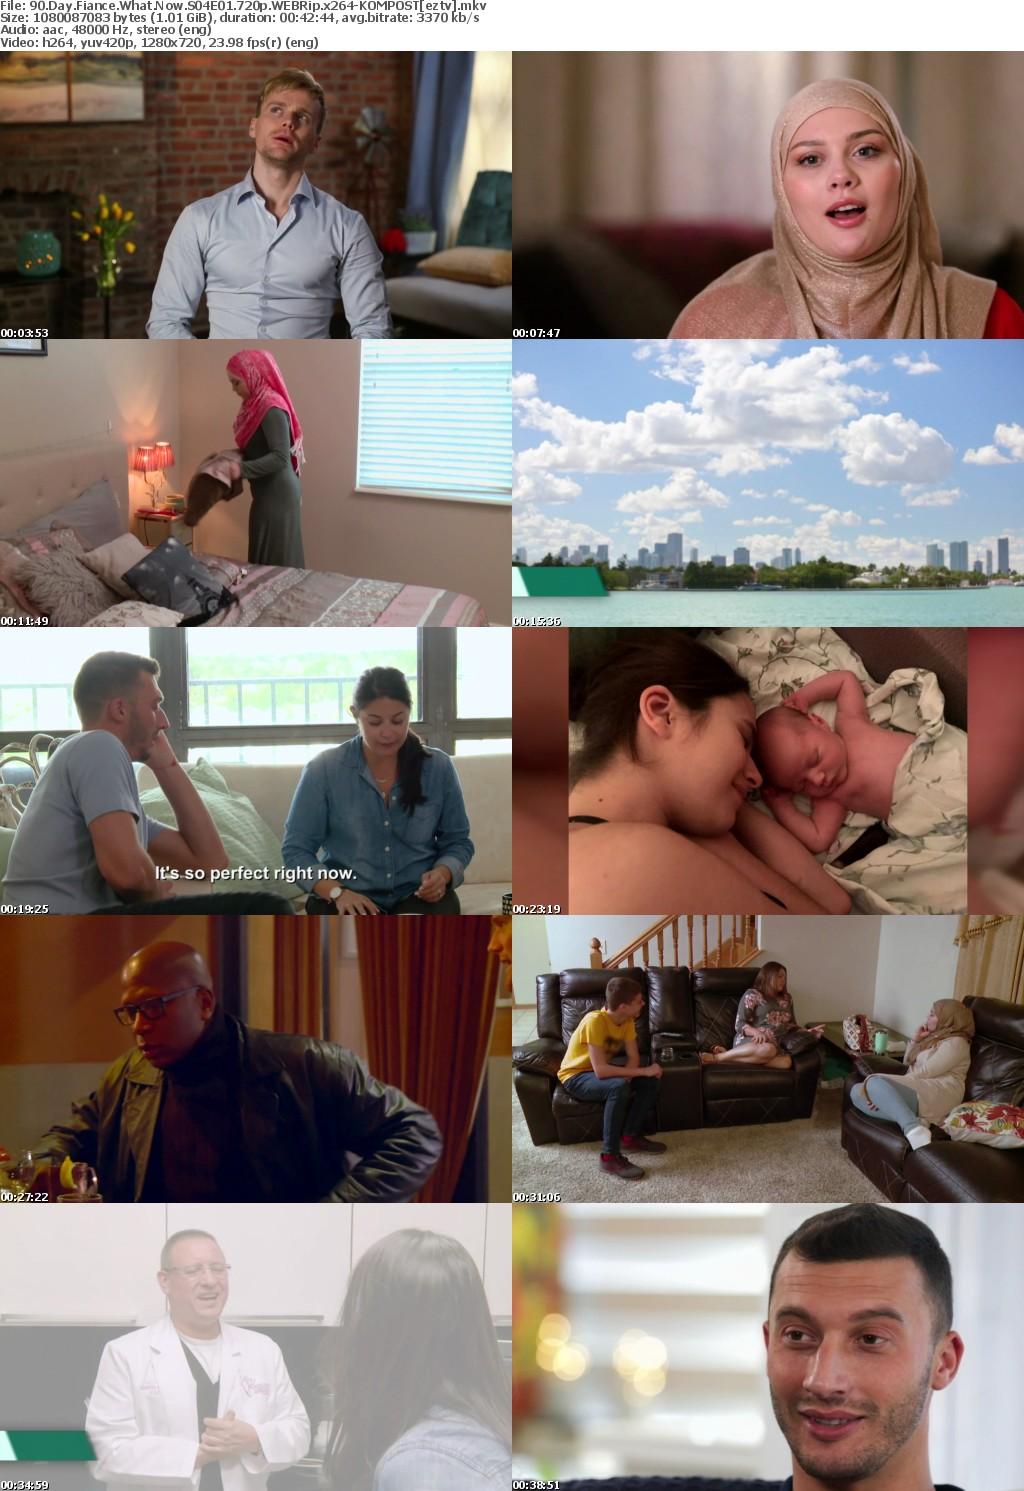 90 Day Fiance What Now S04E01 720p WEBRip x264-KOMPOST